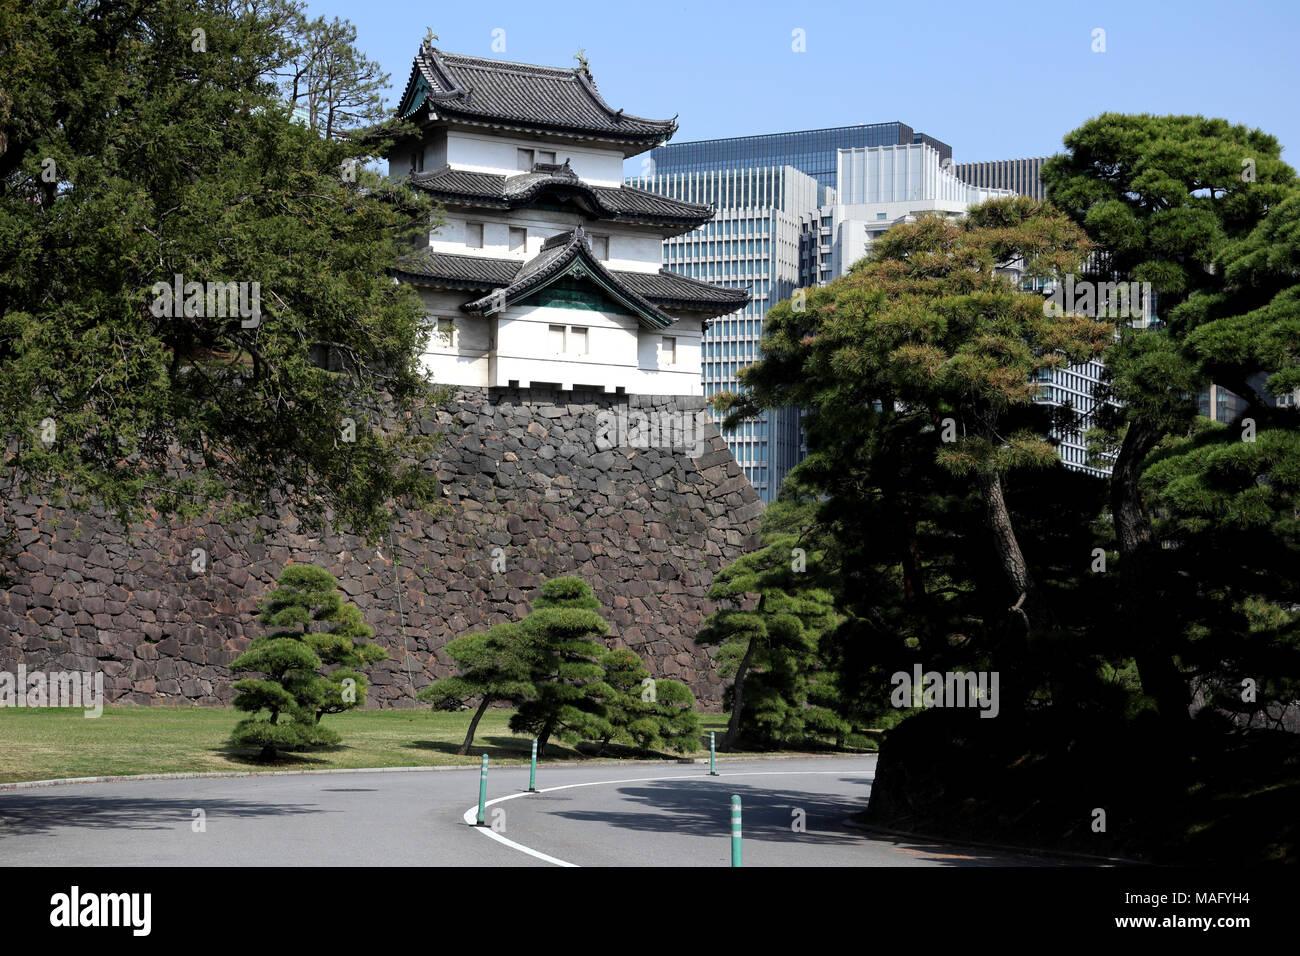 Fujimi Yagura keep of Imperial Palace, Tokyo, Japan - Stock Image